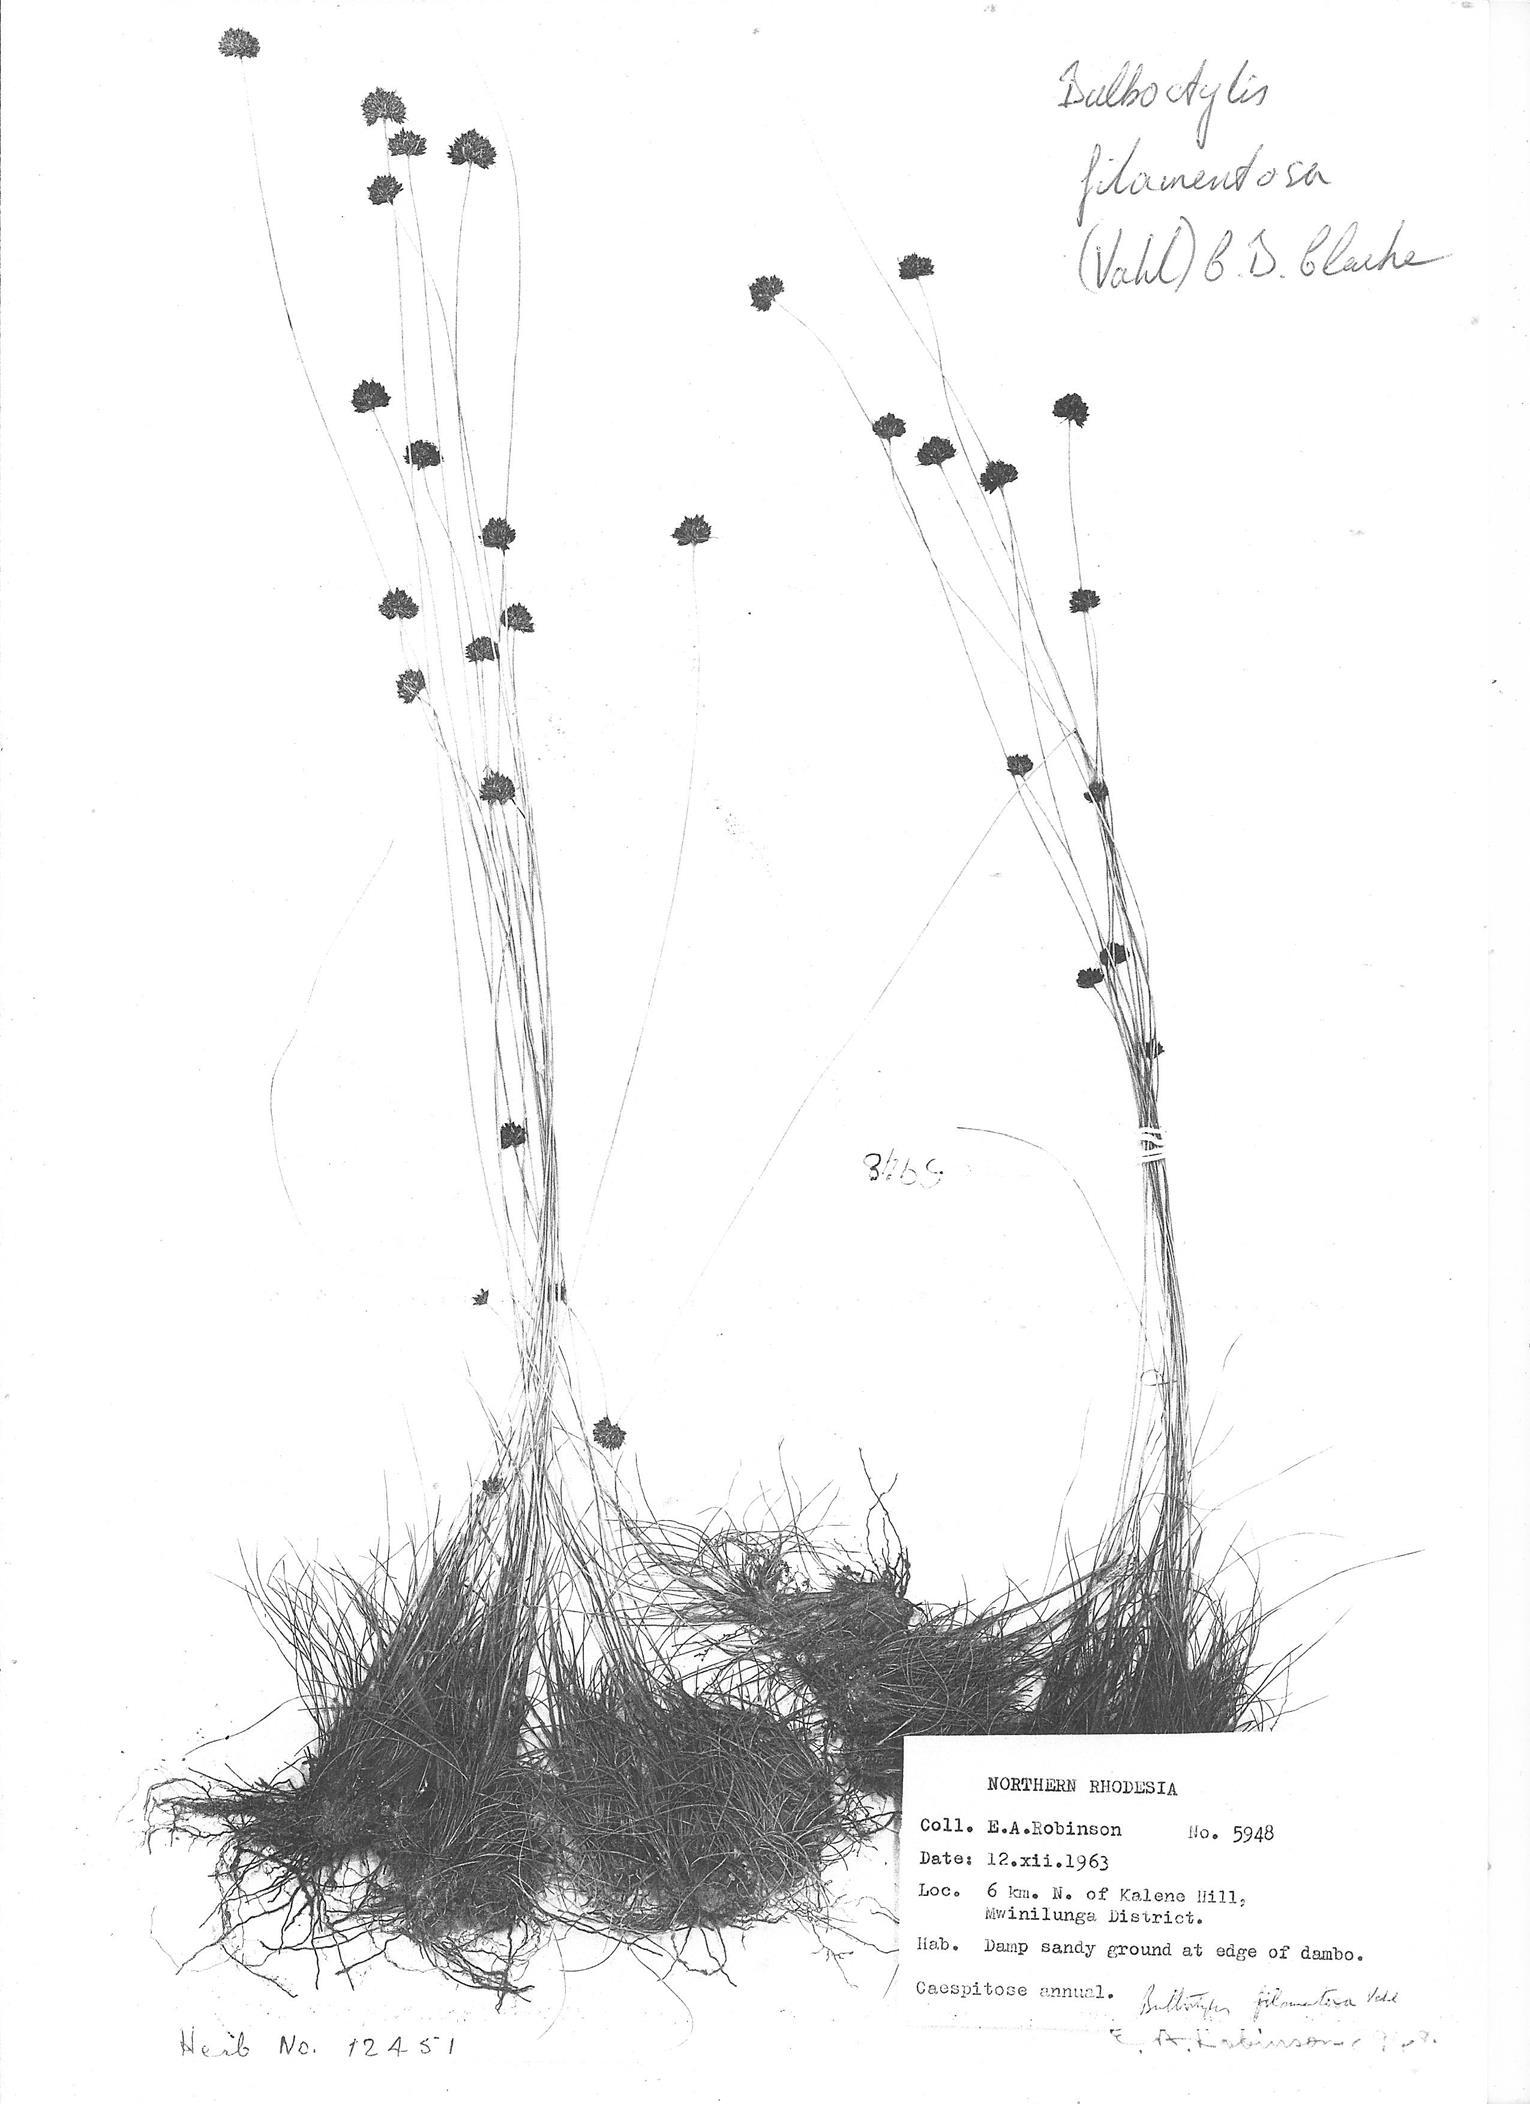 Bulbostylis filamentosa